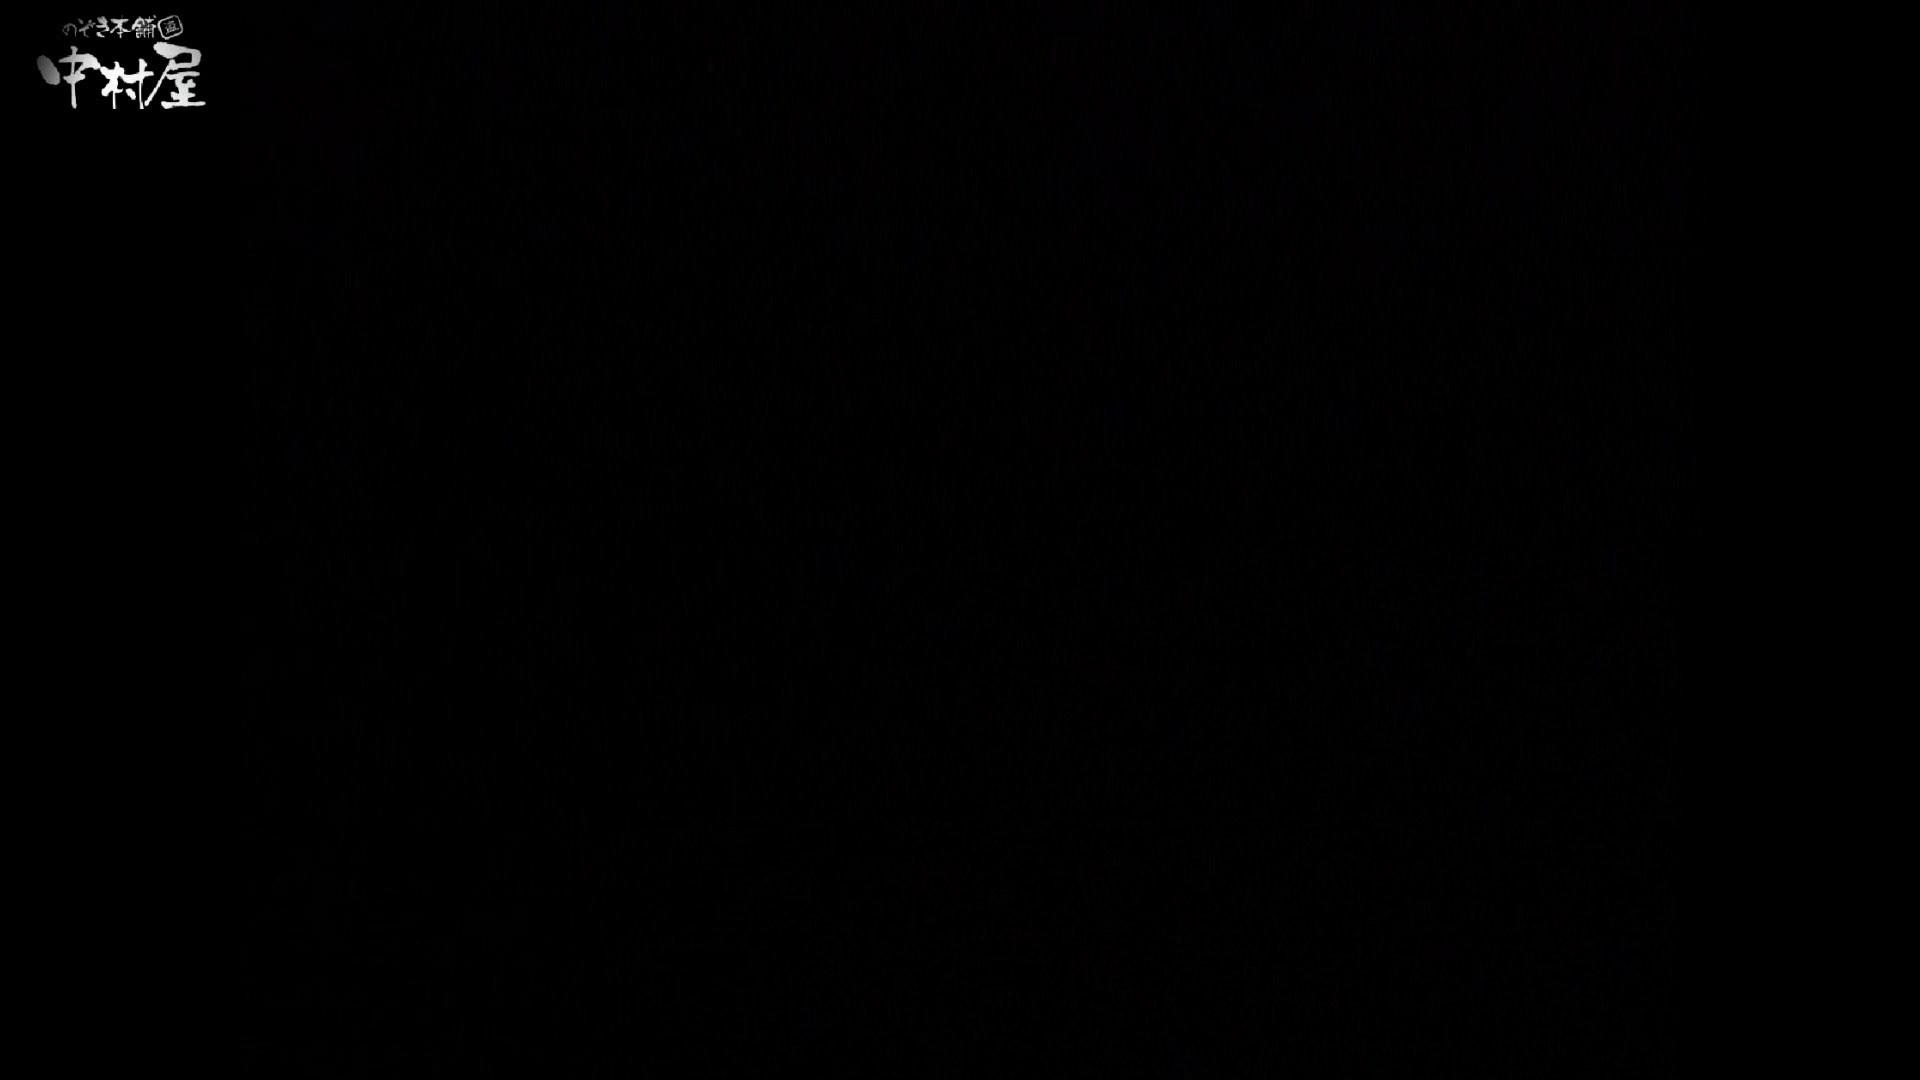 民家風呂専門盗撮師の超危険映像 vol.018 美女ヌード  62画像 6